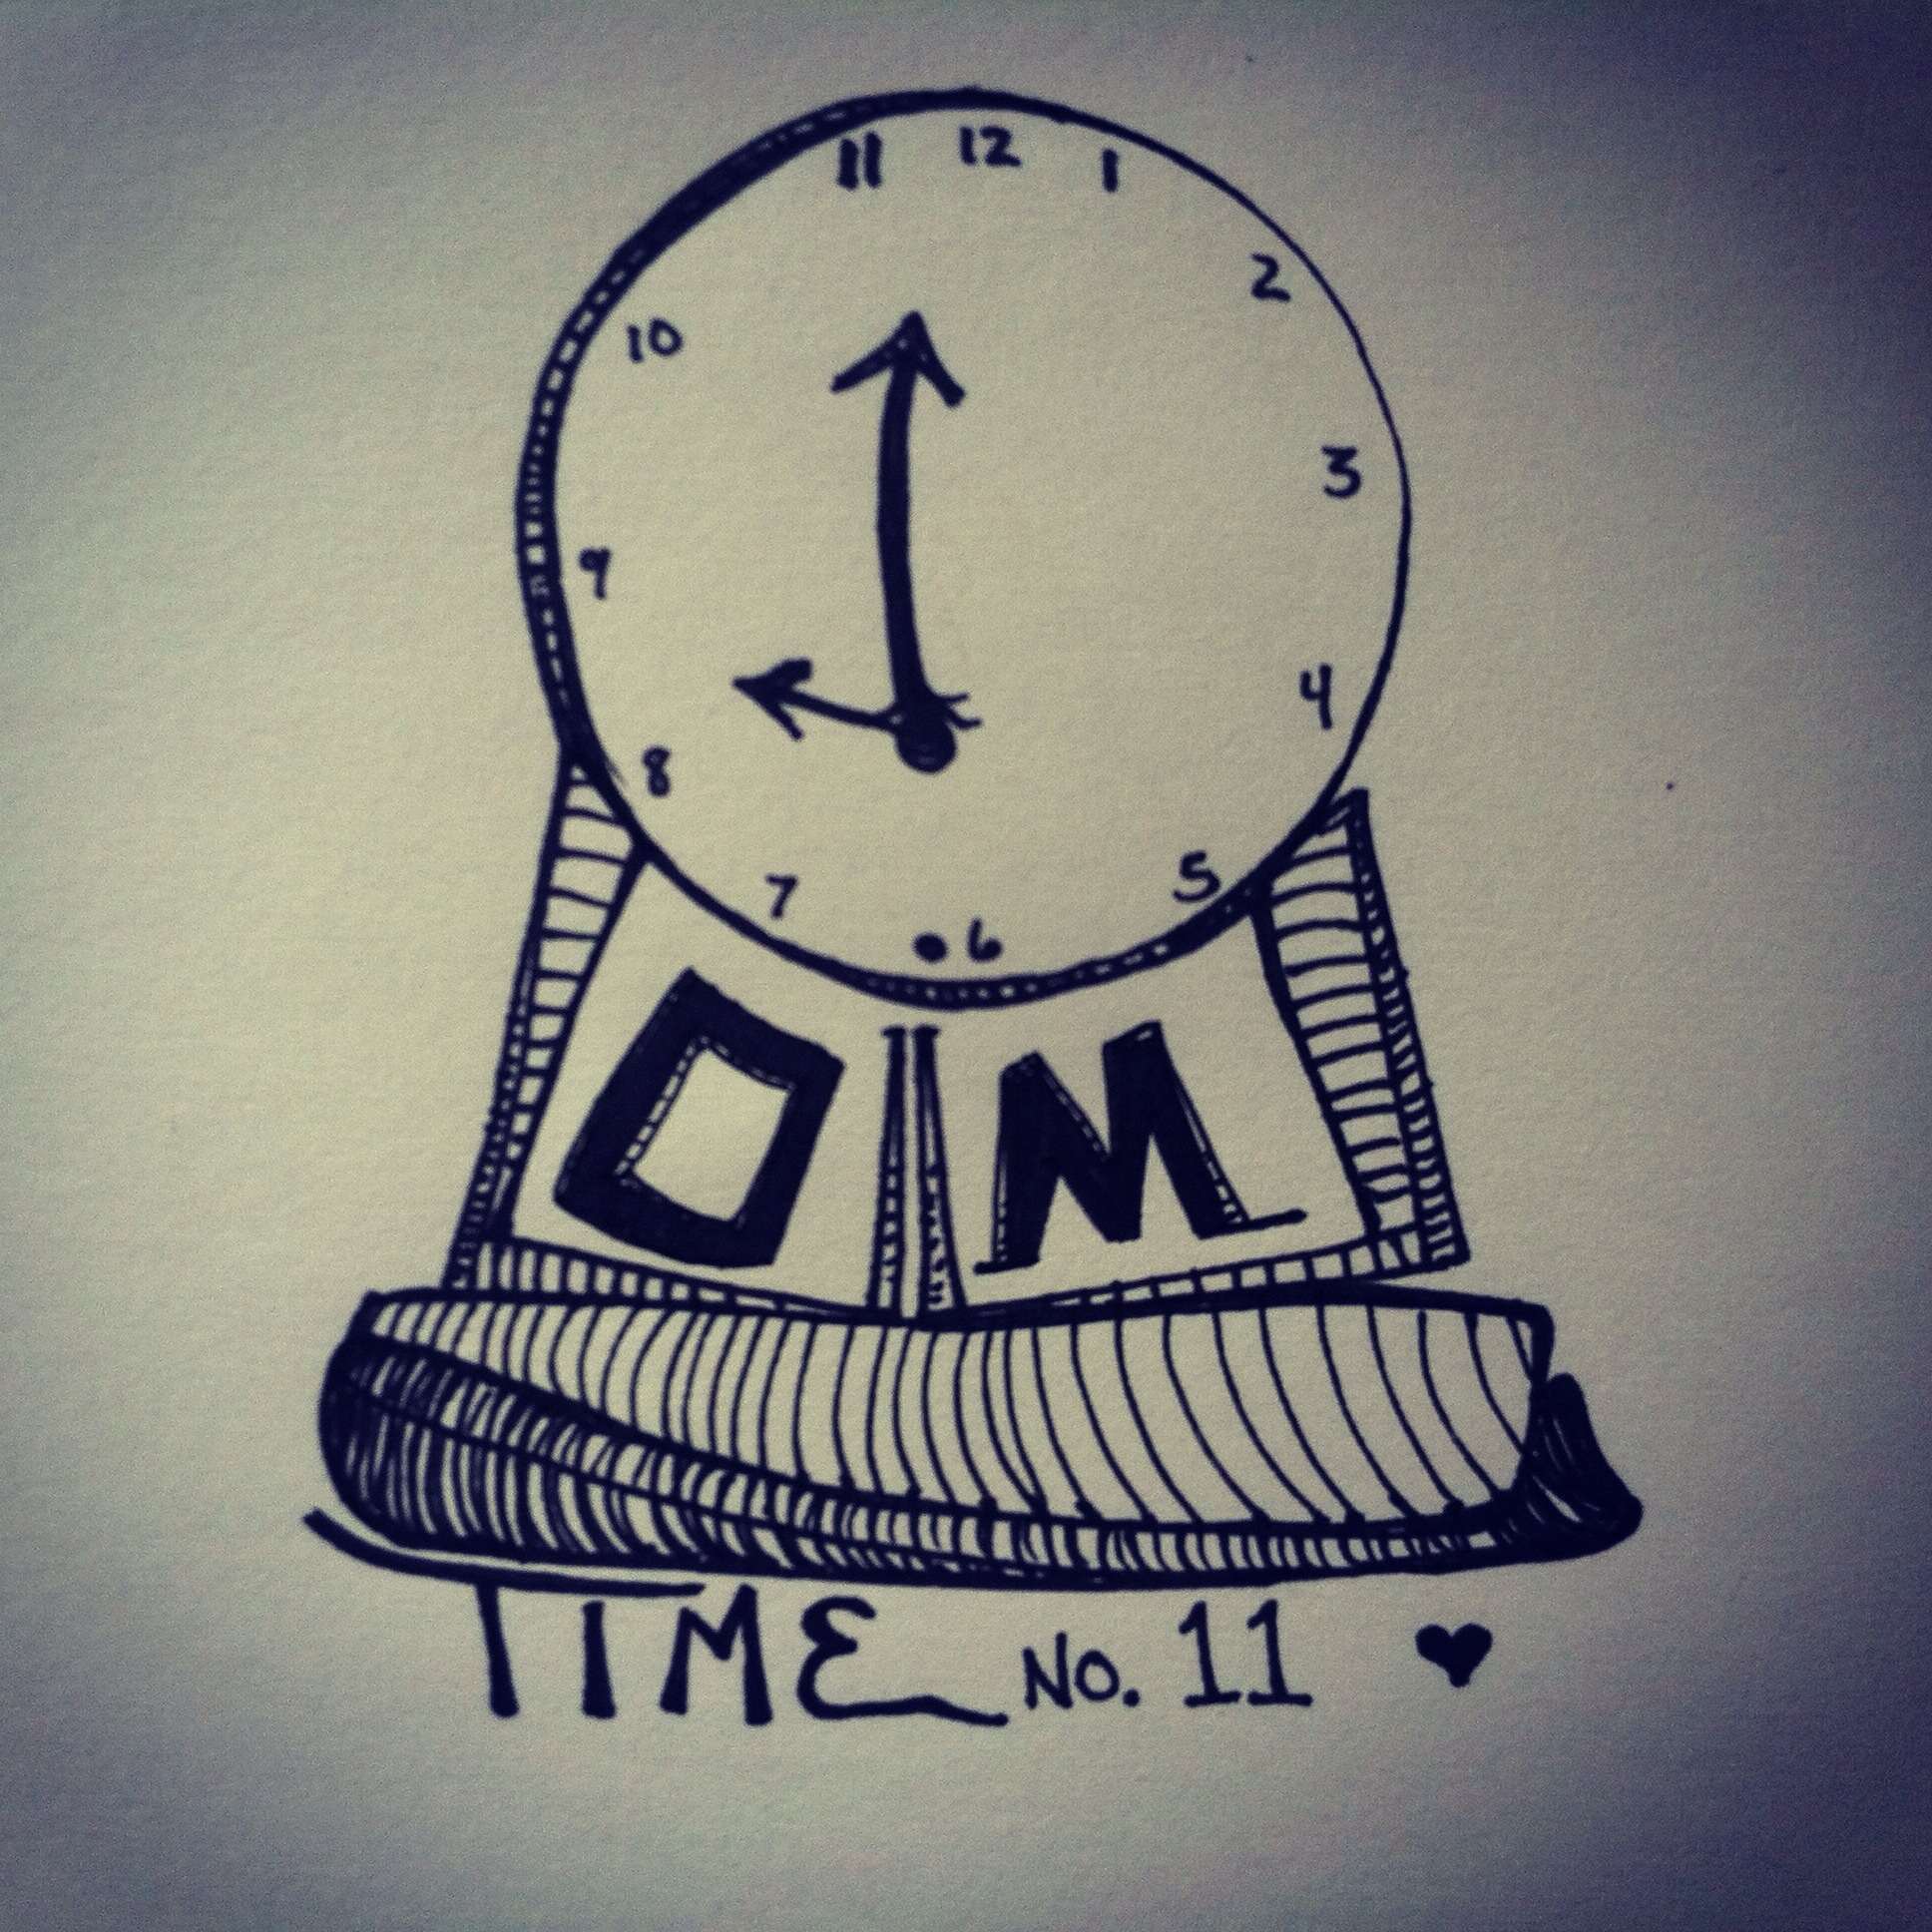 Time no.11